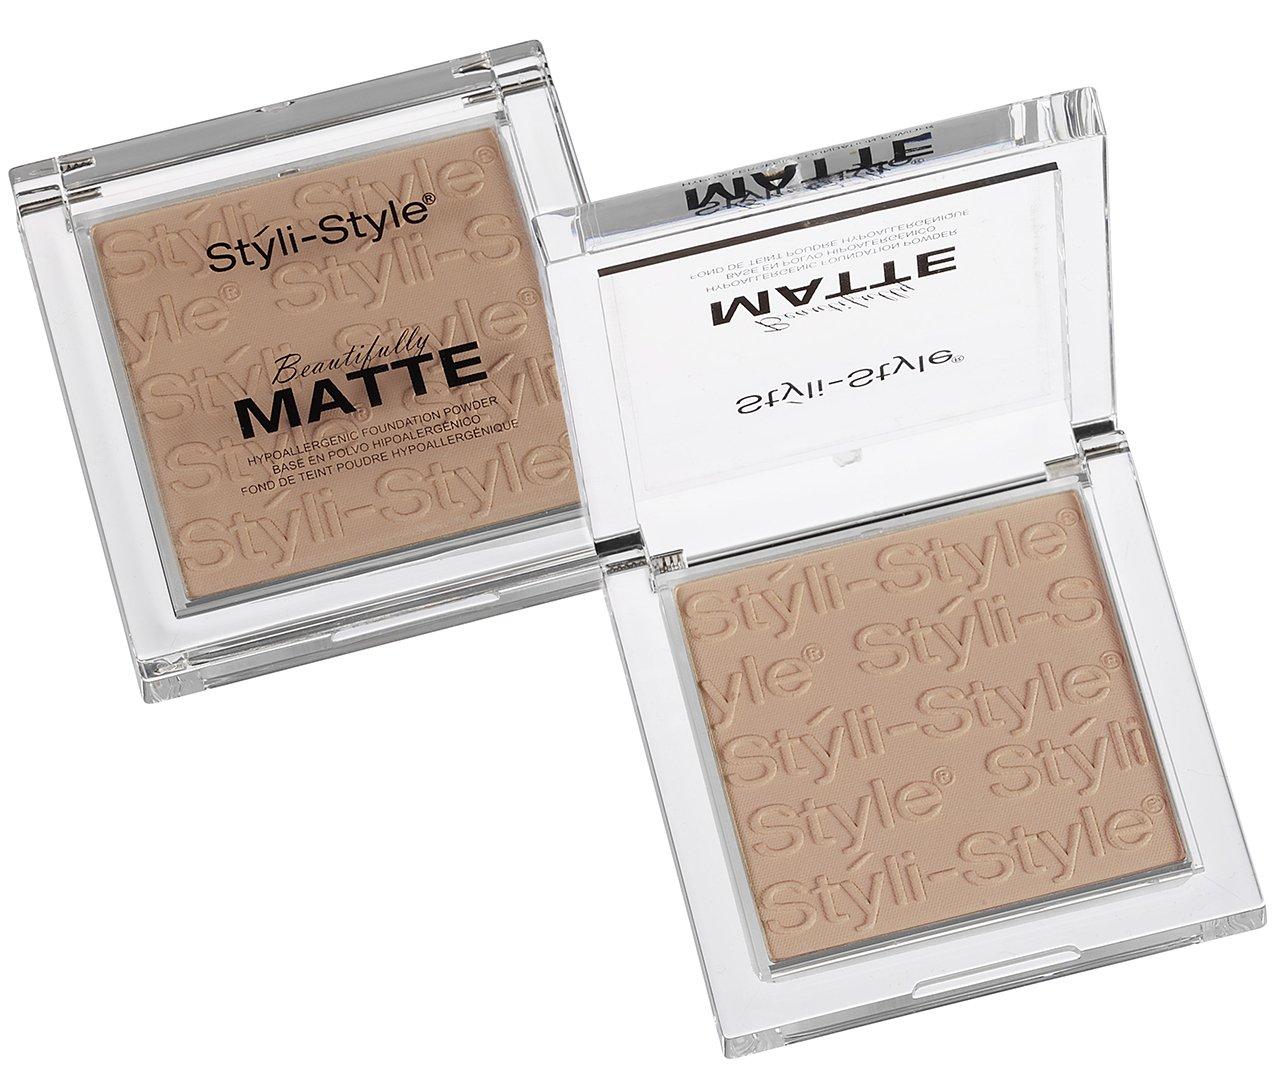 Styli-Style Cosmetics Beautifully Matte - Face Powder - Warm Beige, .32 oz/(9g)